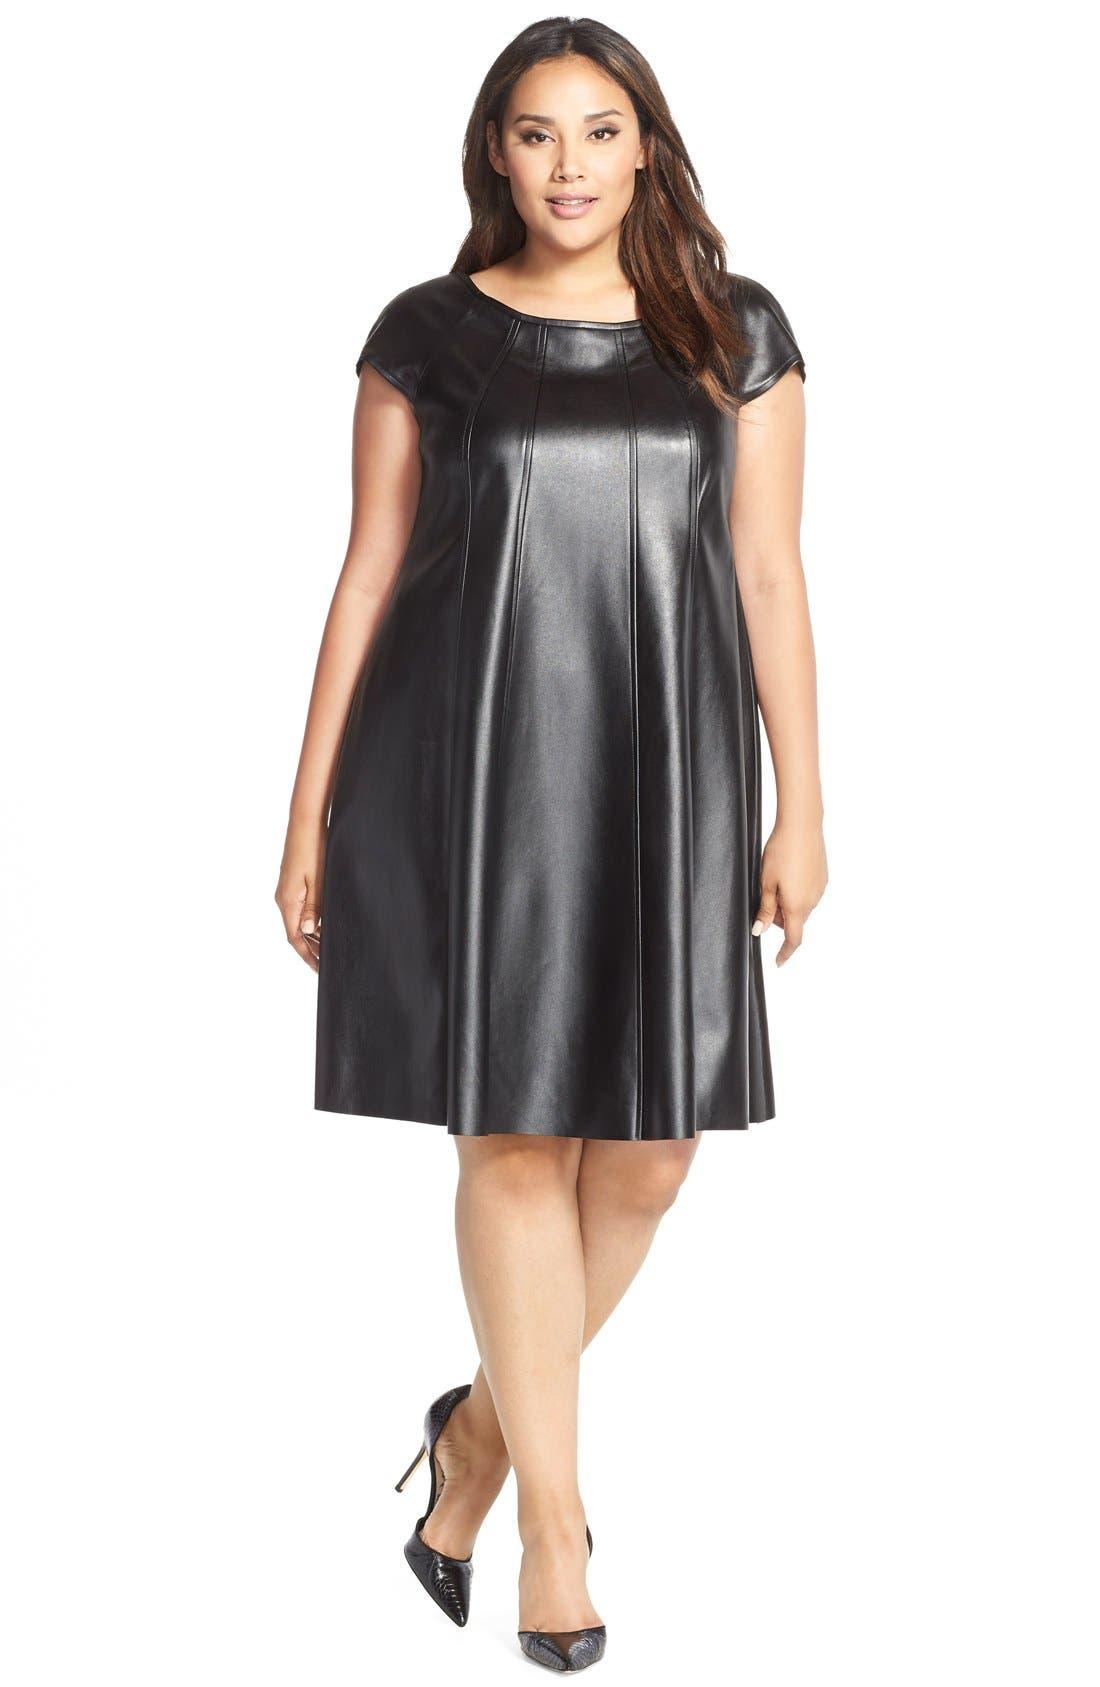 Alternate Image 1 Selected - Gabby Skye FauxLeather Trapeze Dress (Plus Size)